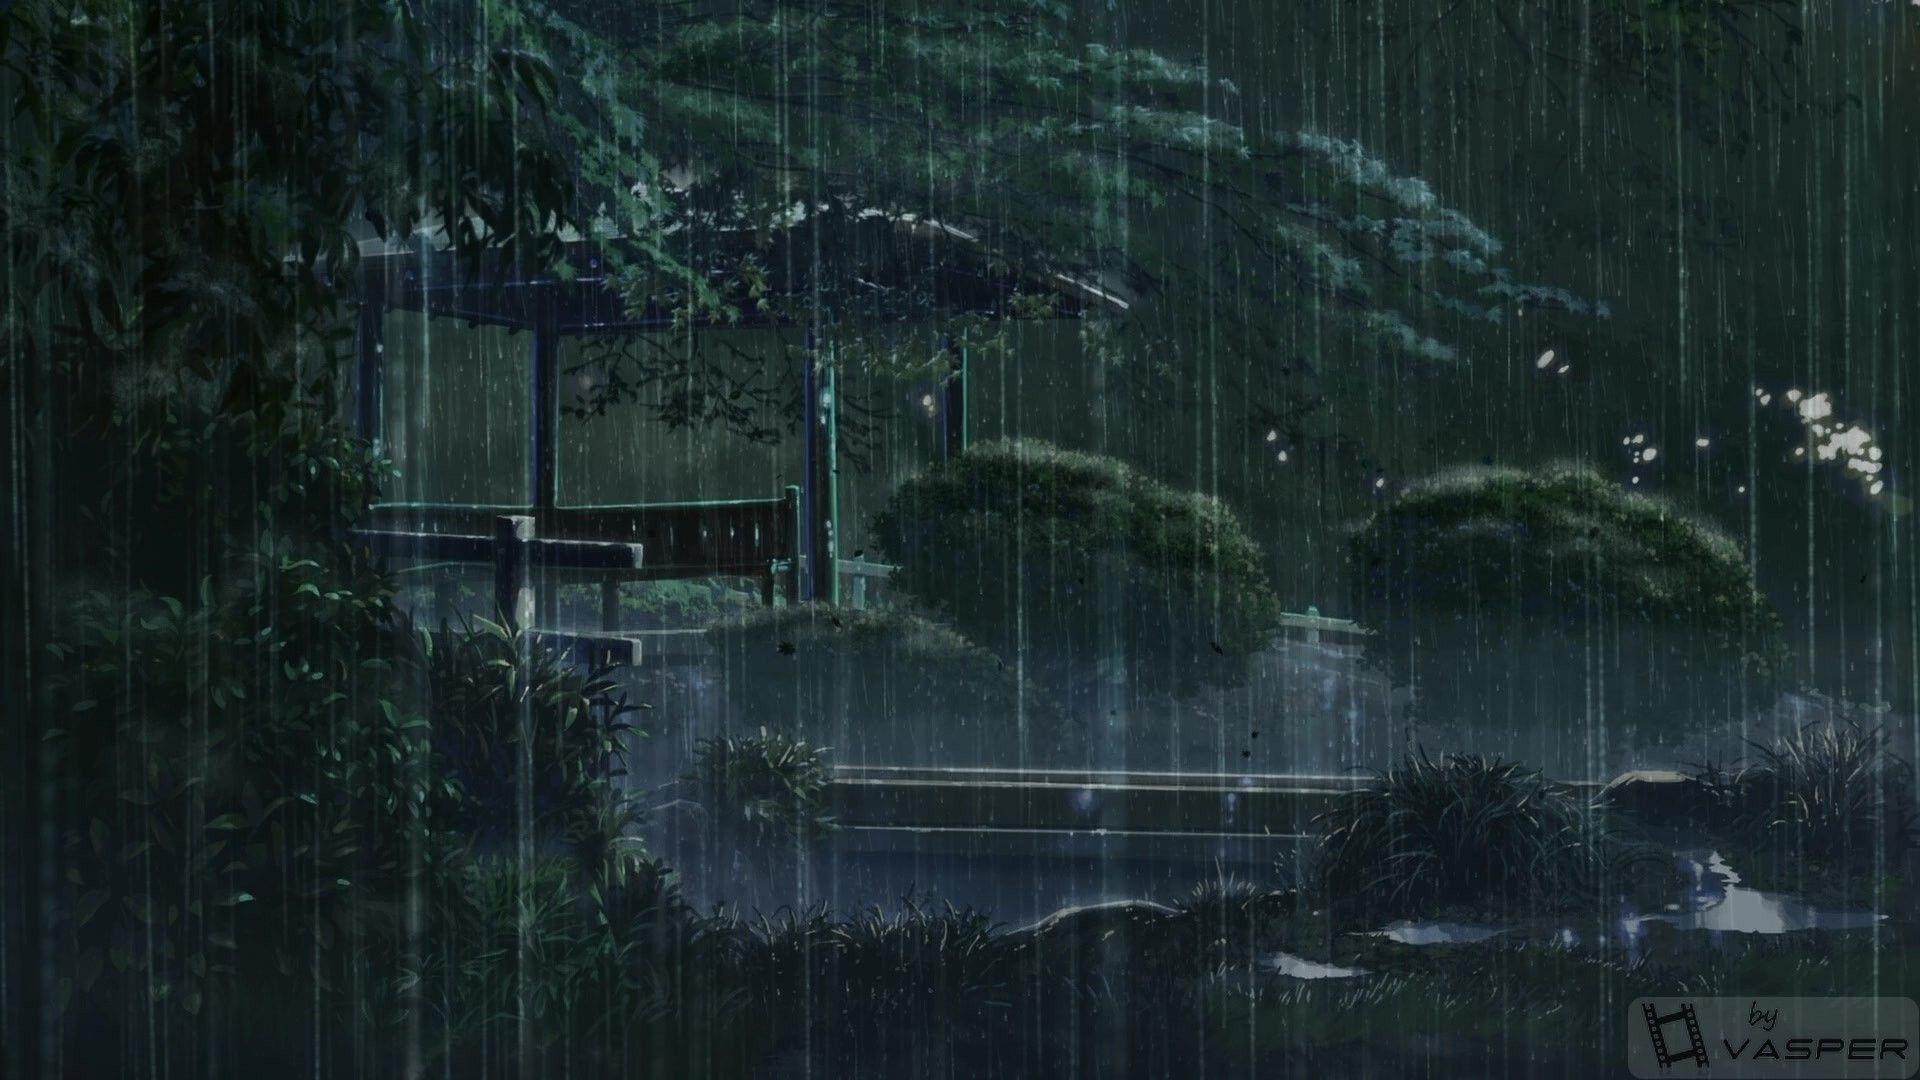 Kotonoha No Niwa The Garden Of Words Scenery Anime Filmes